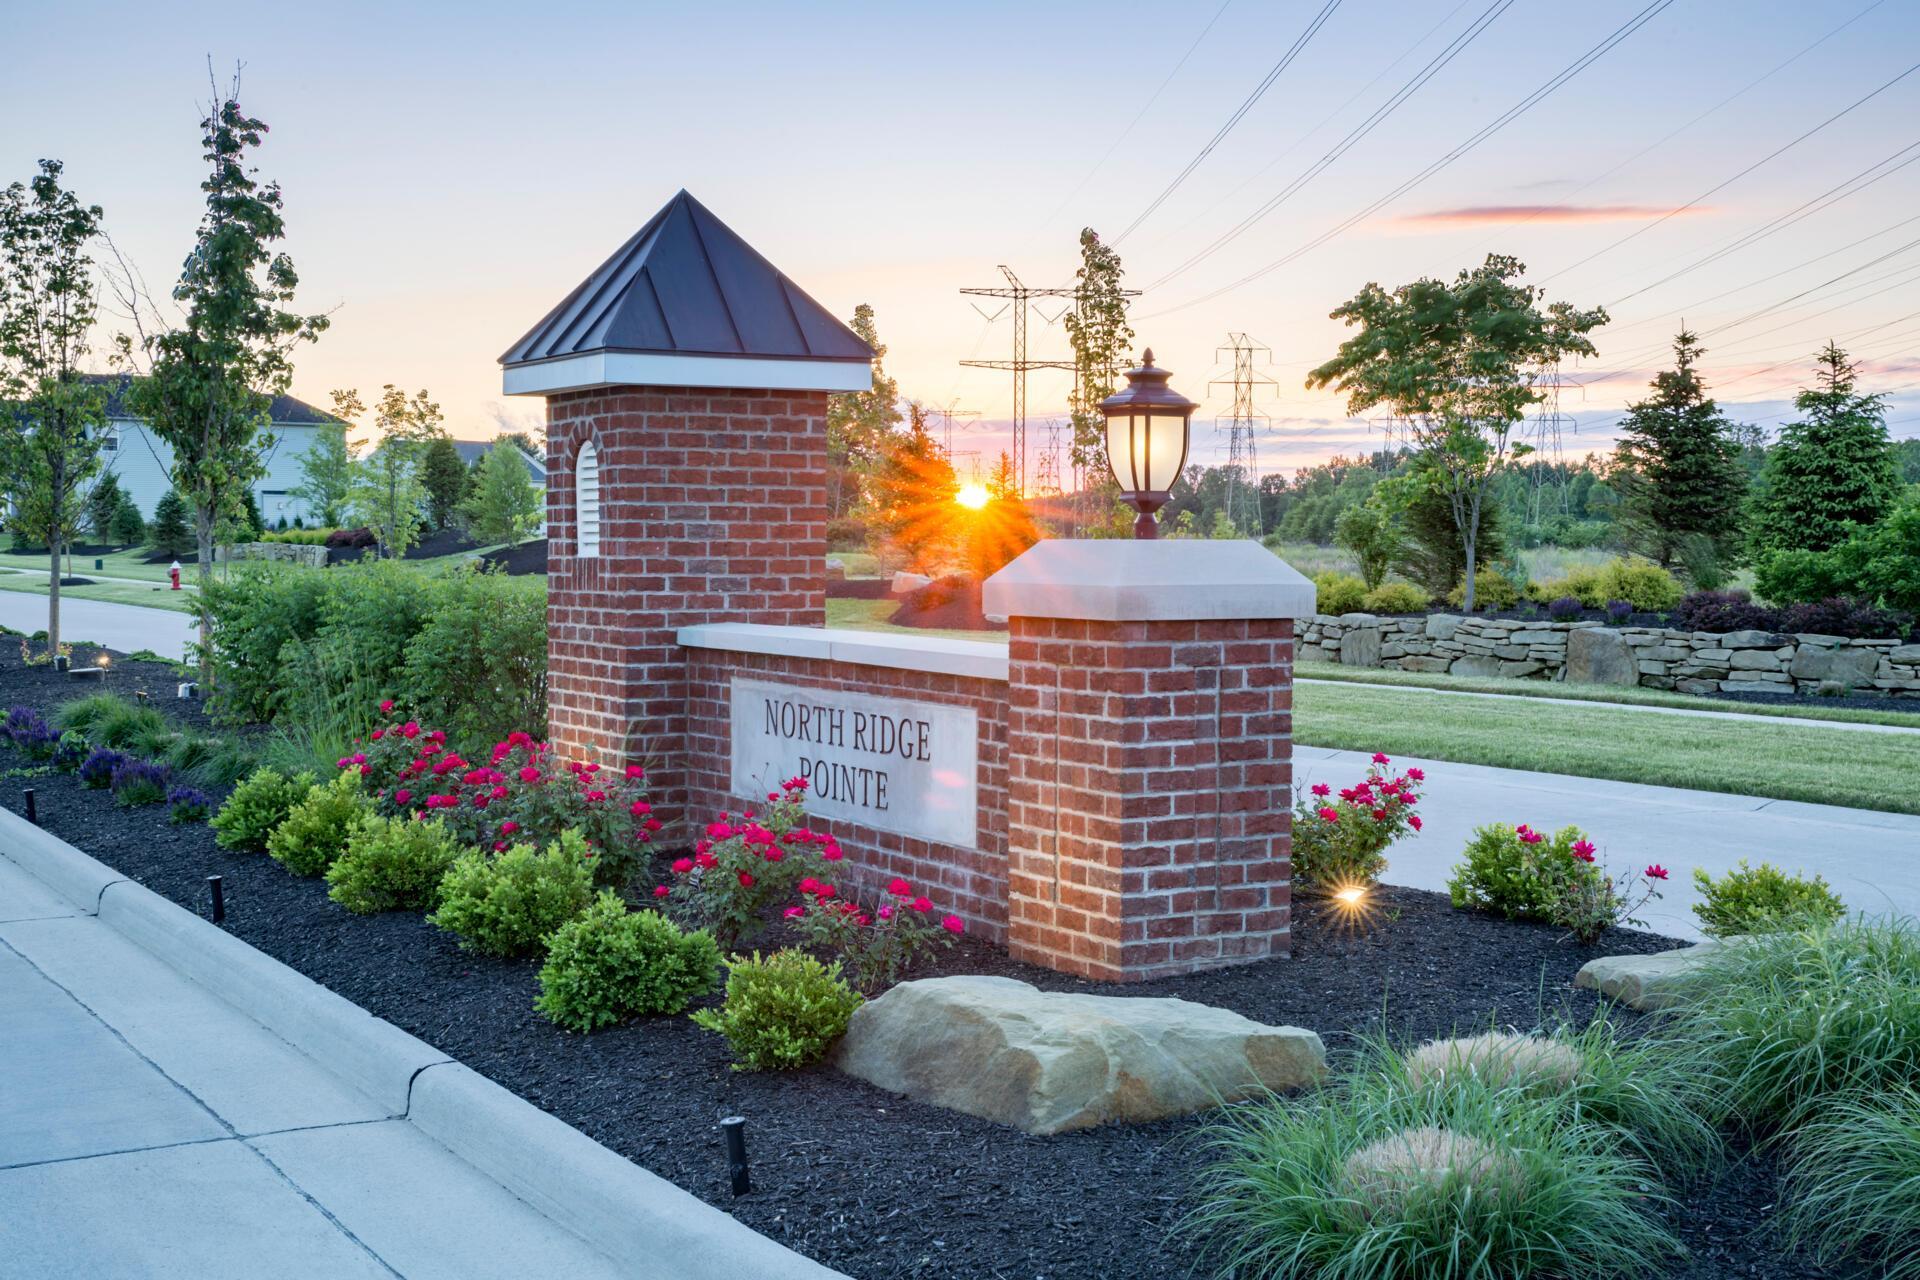 The North Ridge Pointe Community Entrance